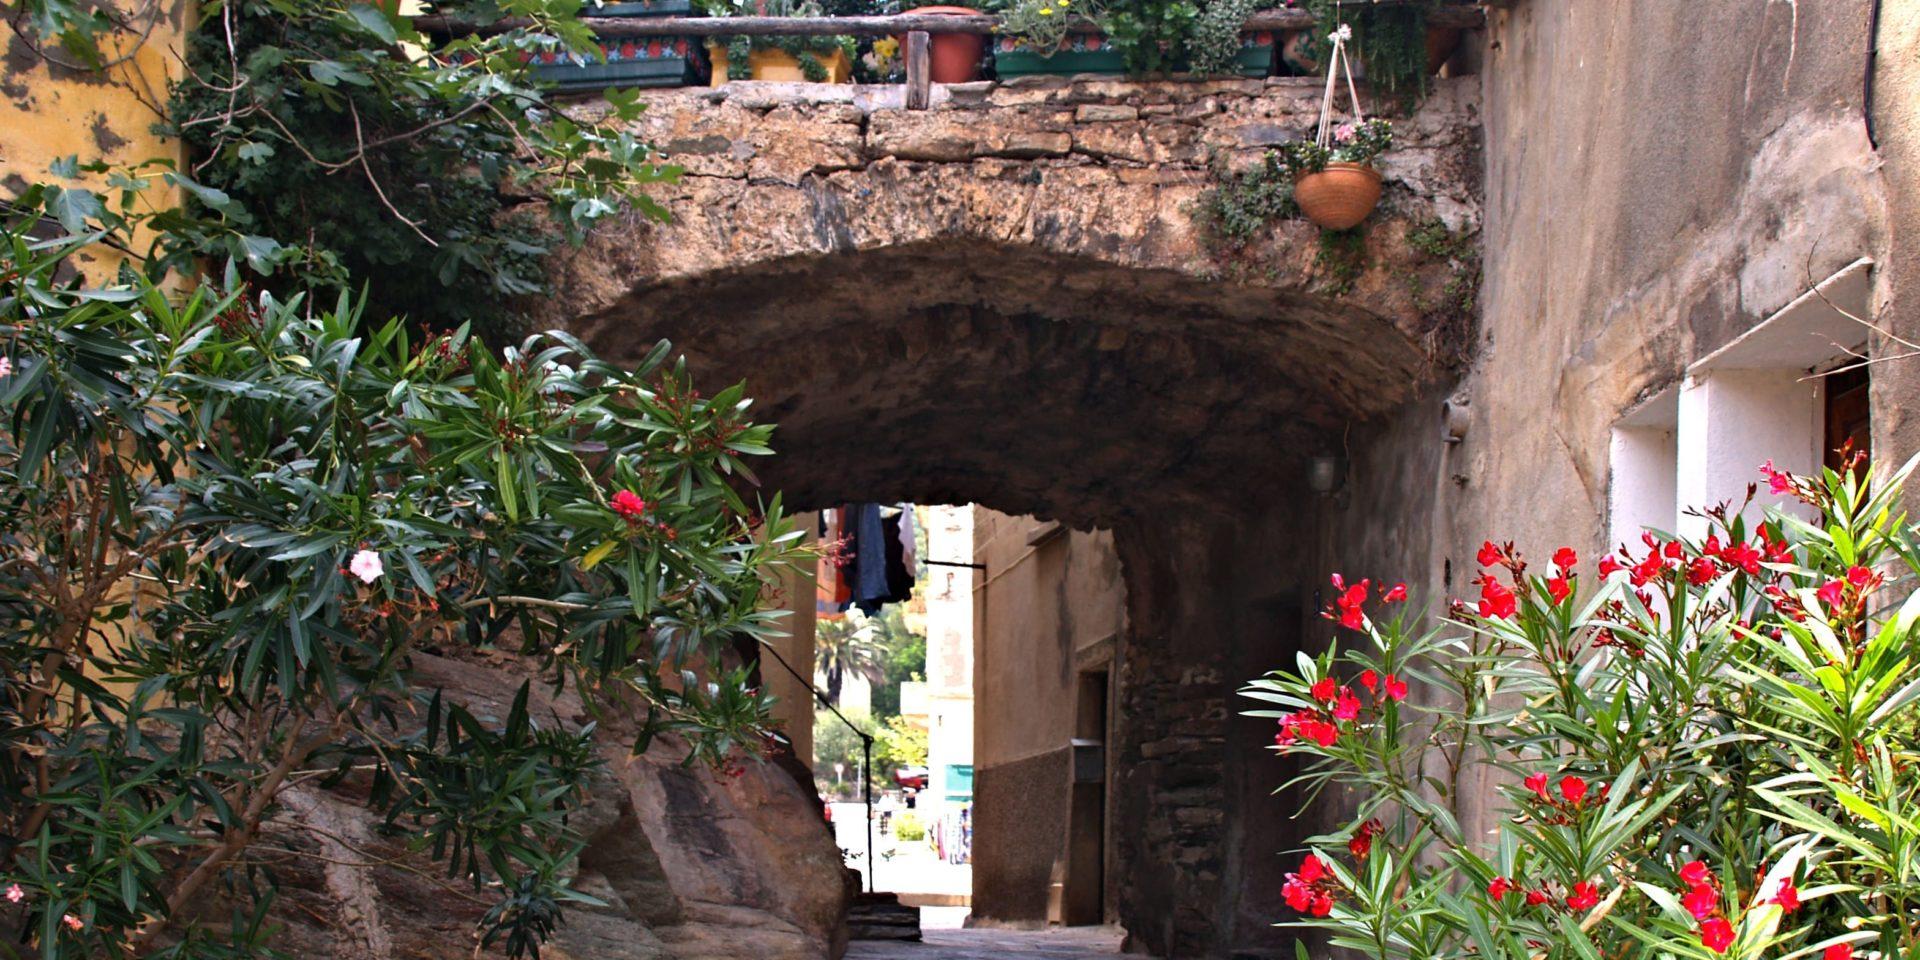 Hotel Castel Brando Erbalunga Cap Corse Corsica Frankrijk Erbalunga doorkijkje